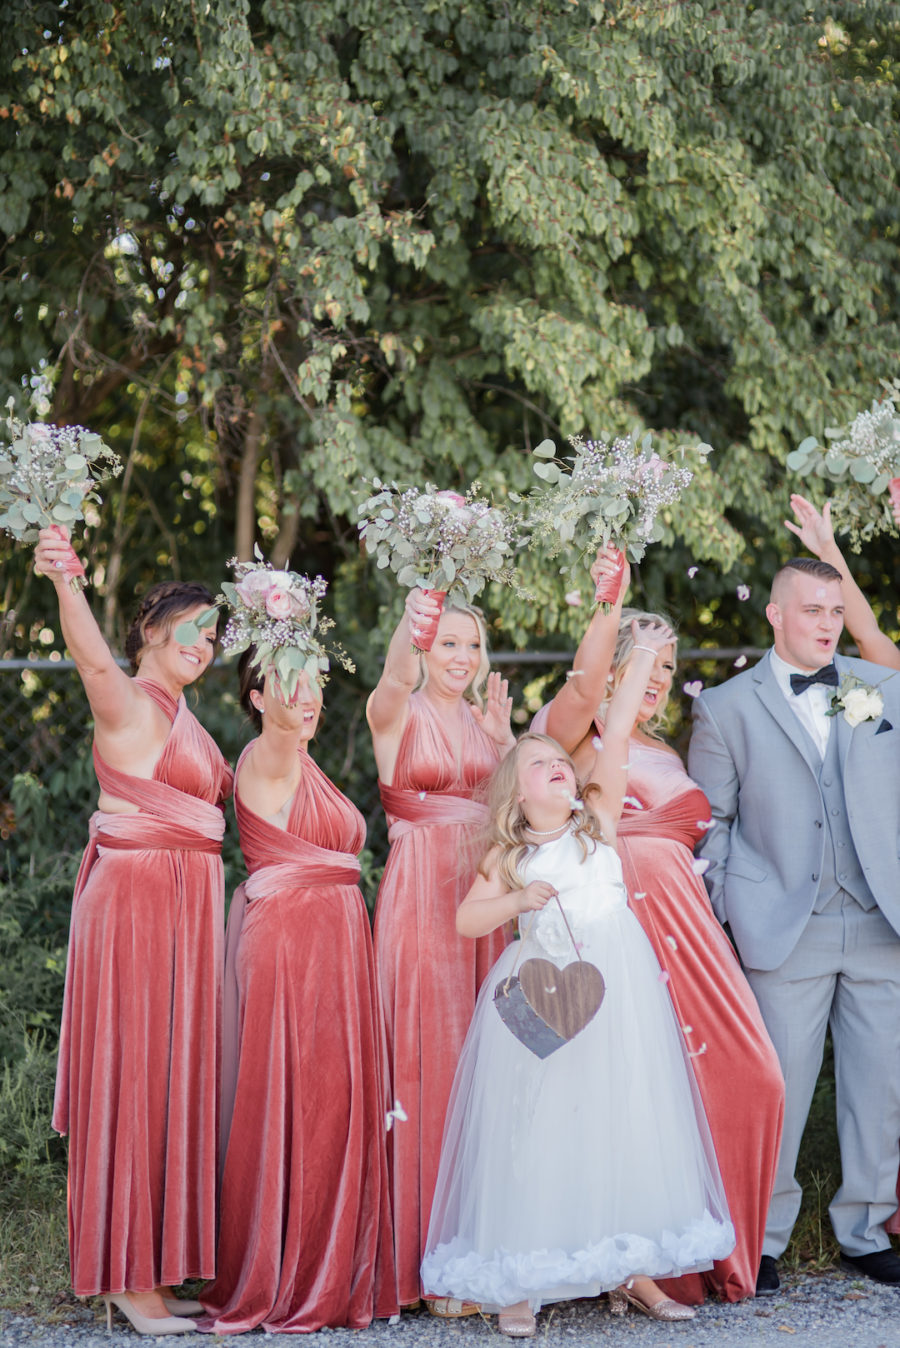 Pink Bridesmaids Dresses: Romantic Blush & Metallic Inspired Wedding featured on Nashville Bride Guide